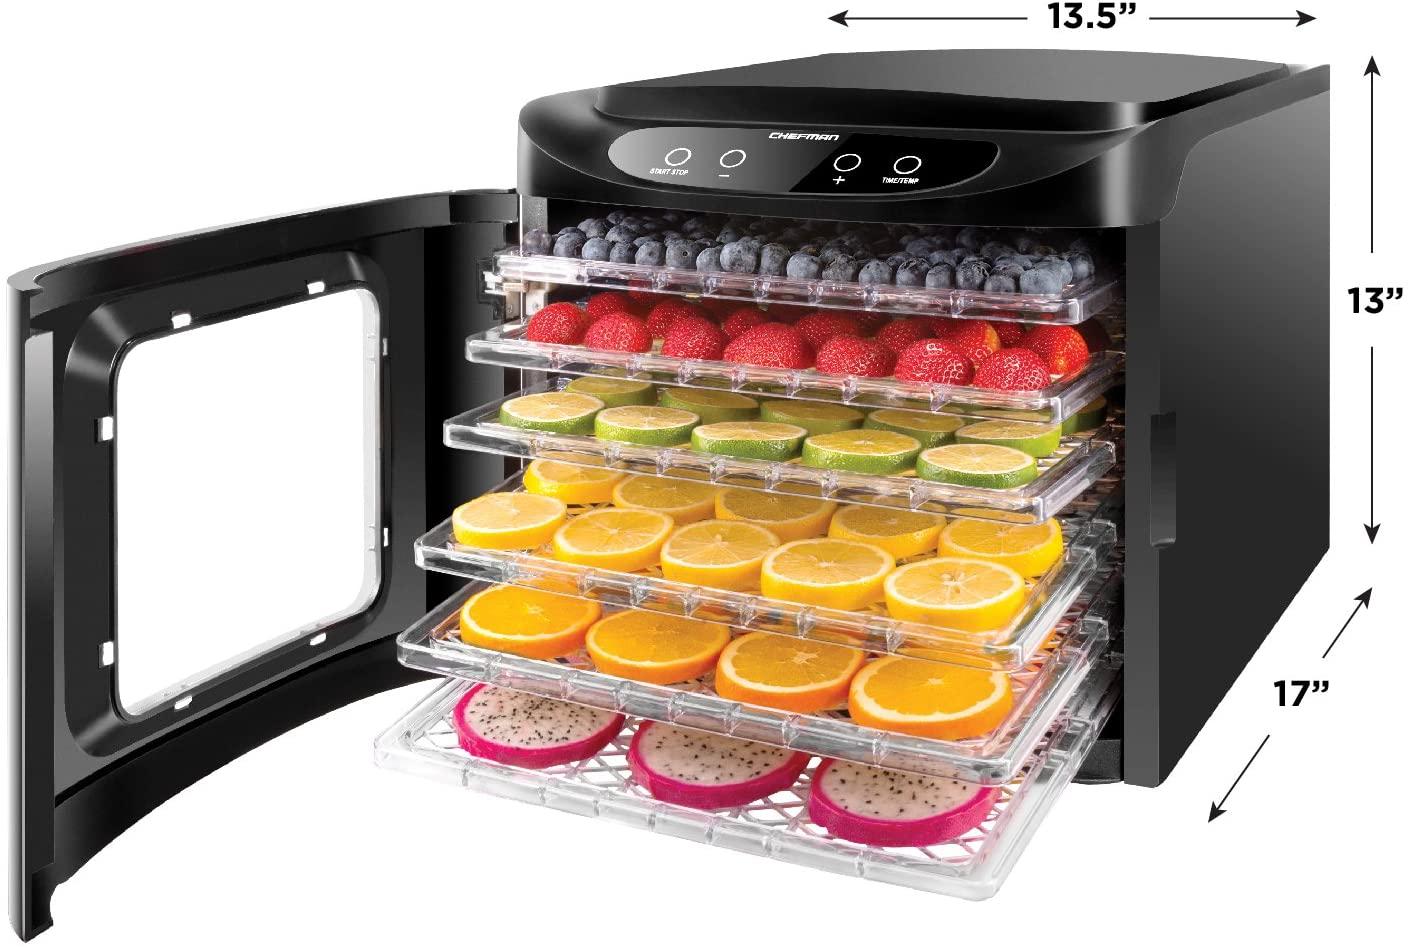 Chefman Touch Screen Electric Food Dehydrator Machine (Black)